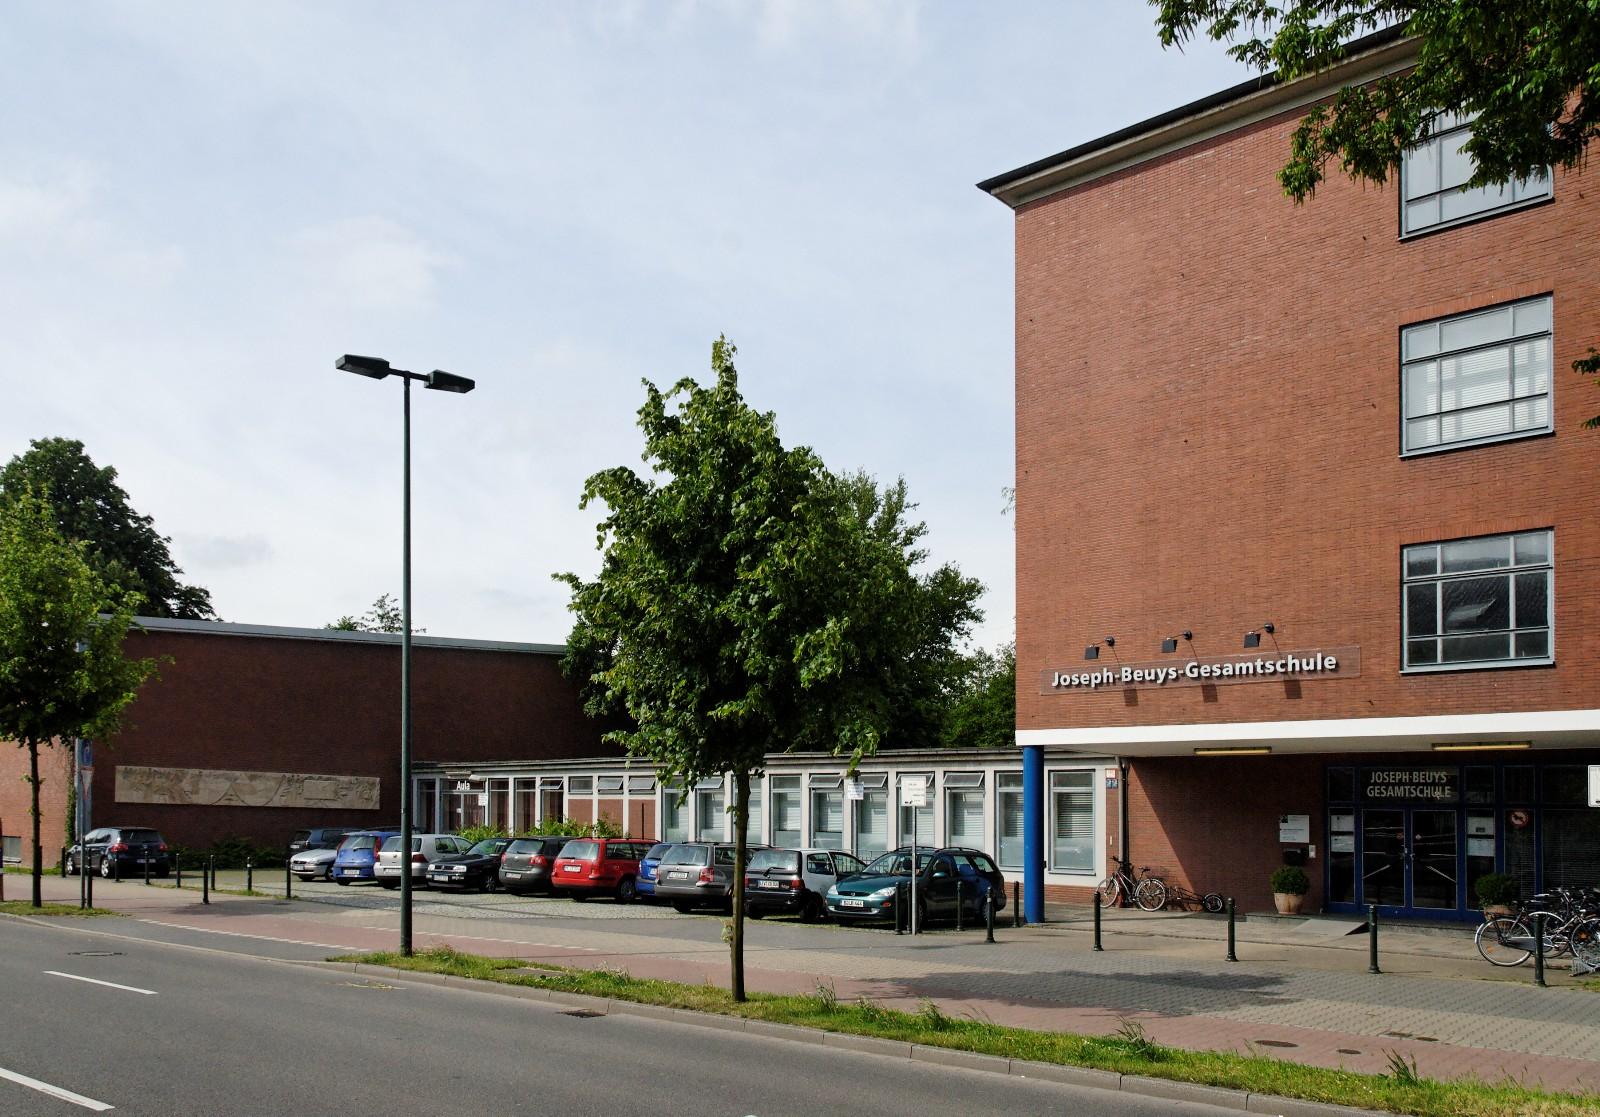 file joseph beuys gesamtschule in duesseldorf oberbilk von wikimedia commons. Black Bedroom Furniture Sets. Home Design Ideas